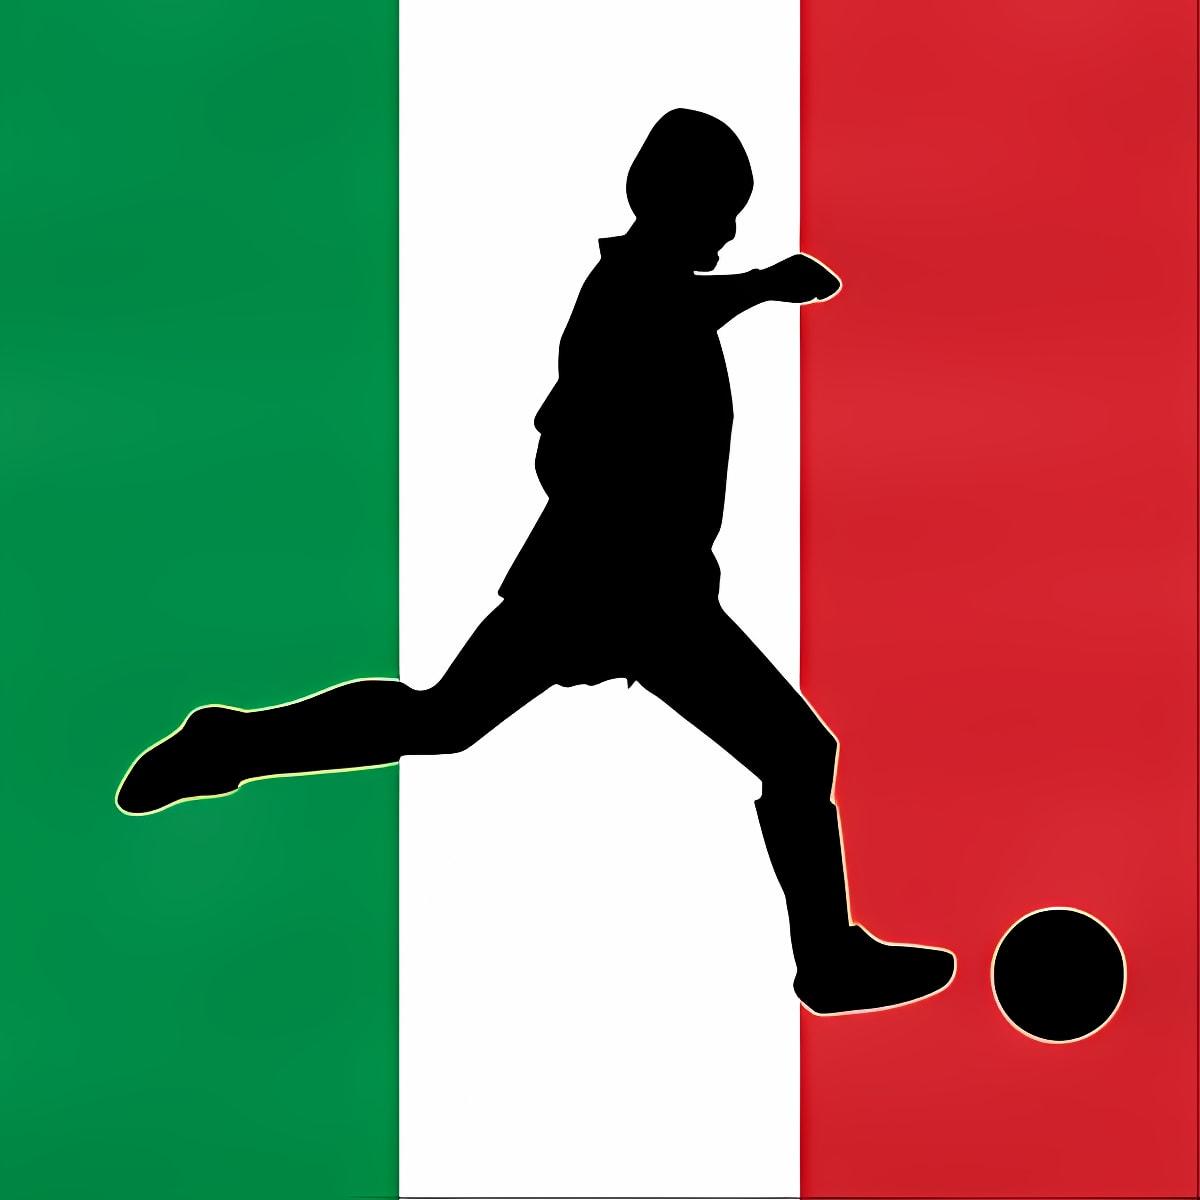 Italian Soccer